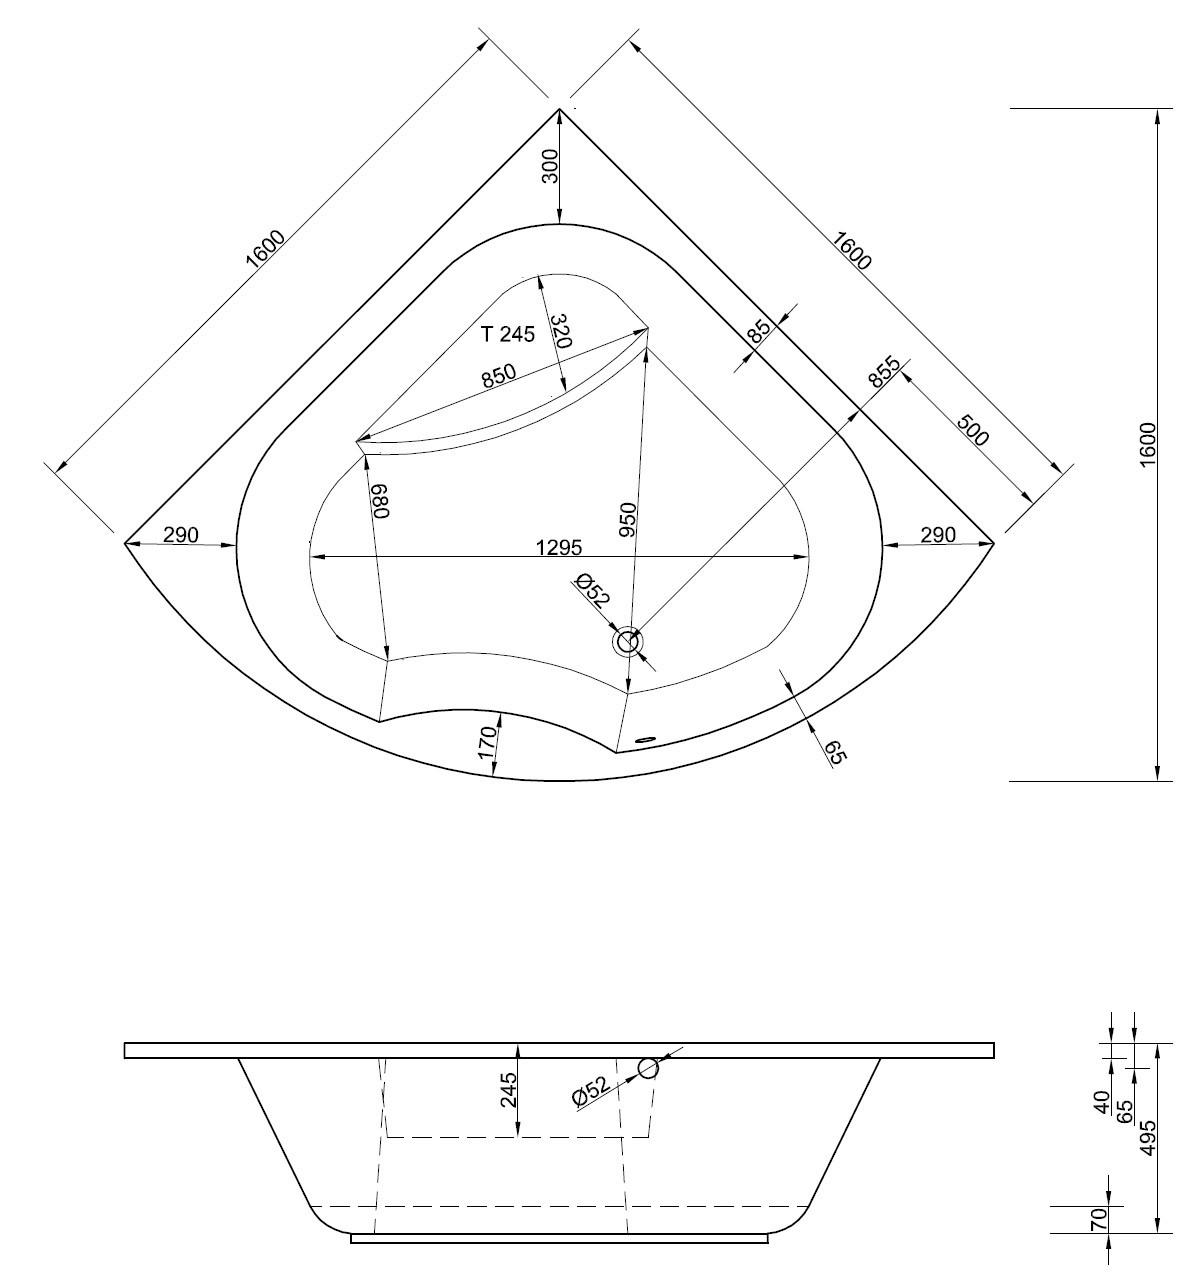 Eckbadewanne 160 x 160 cm | große hohe Eckwanne 1600 | {Eckbadewanne maße 28}